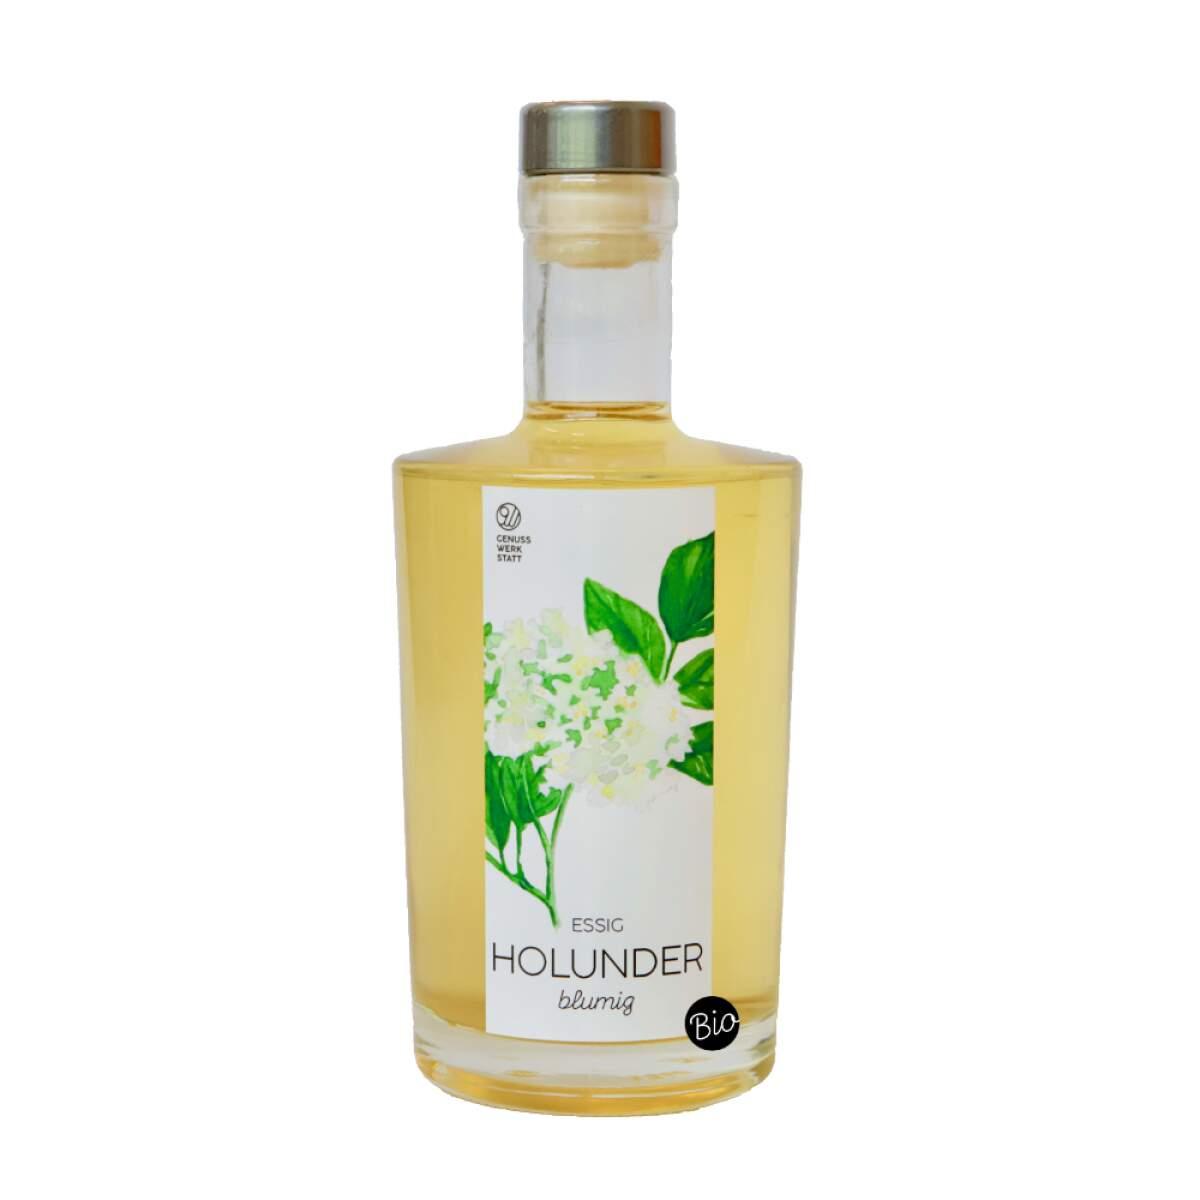 Flasche-Essig-Holunder_Bio_0989_1000pxqQARLNP46iAXN